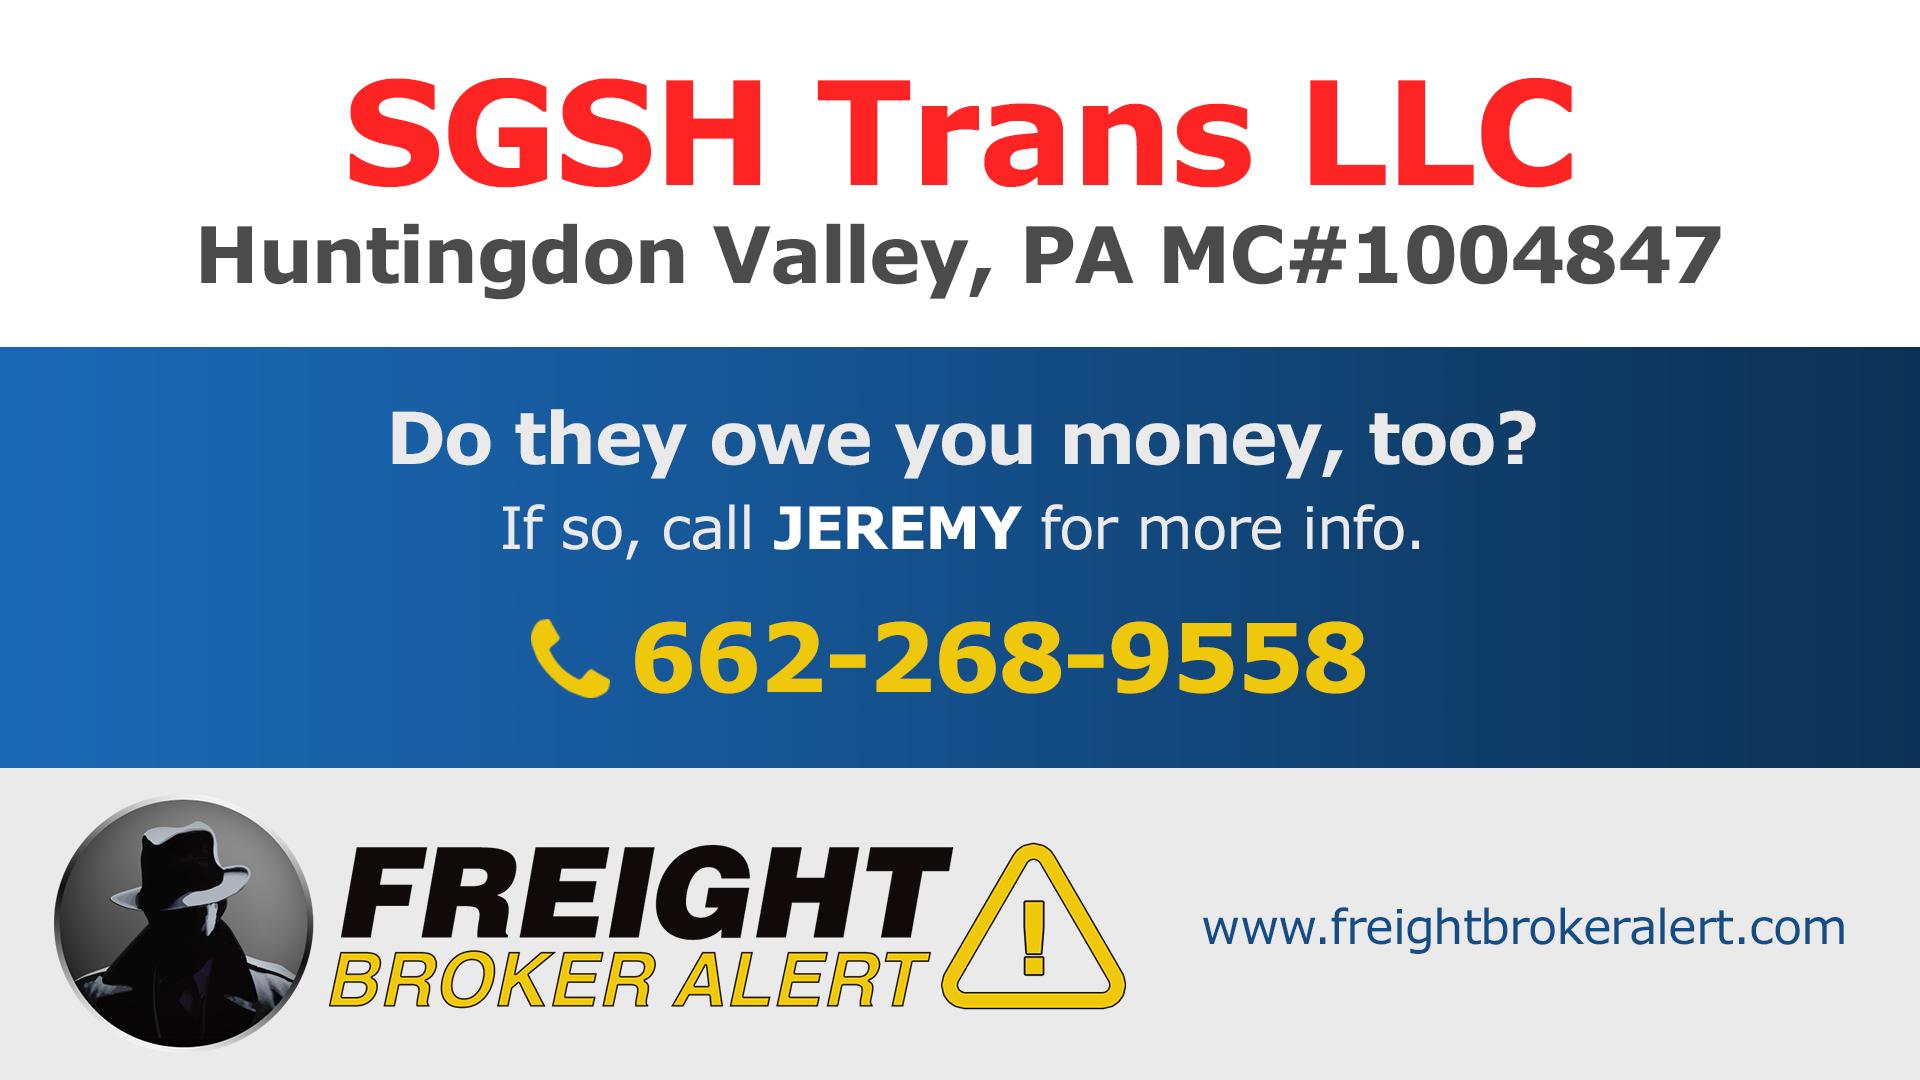 SGSH Trans LLC Pennsylvania